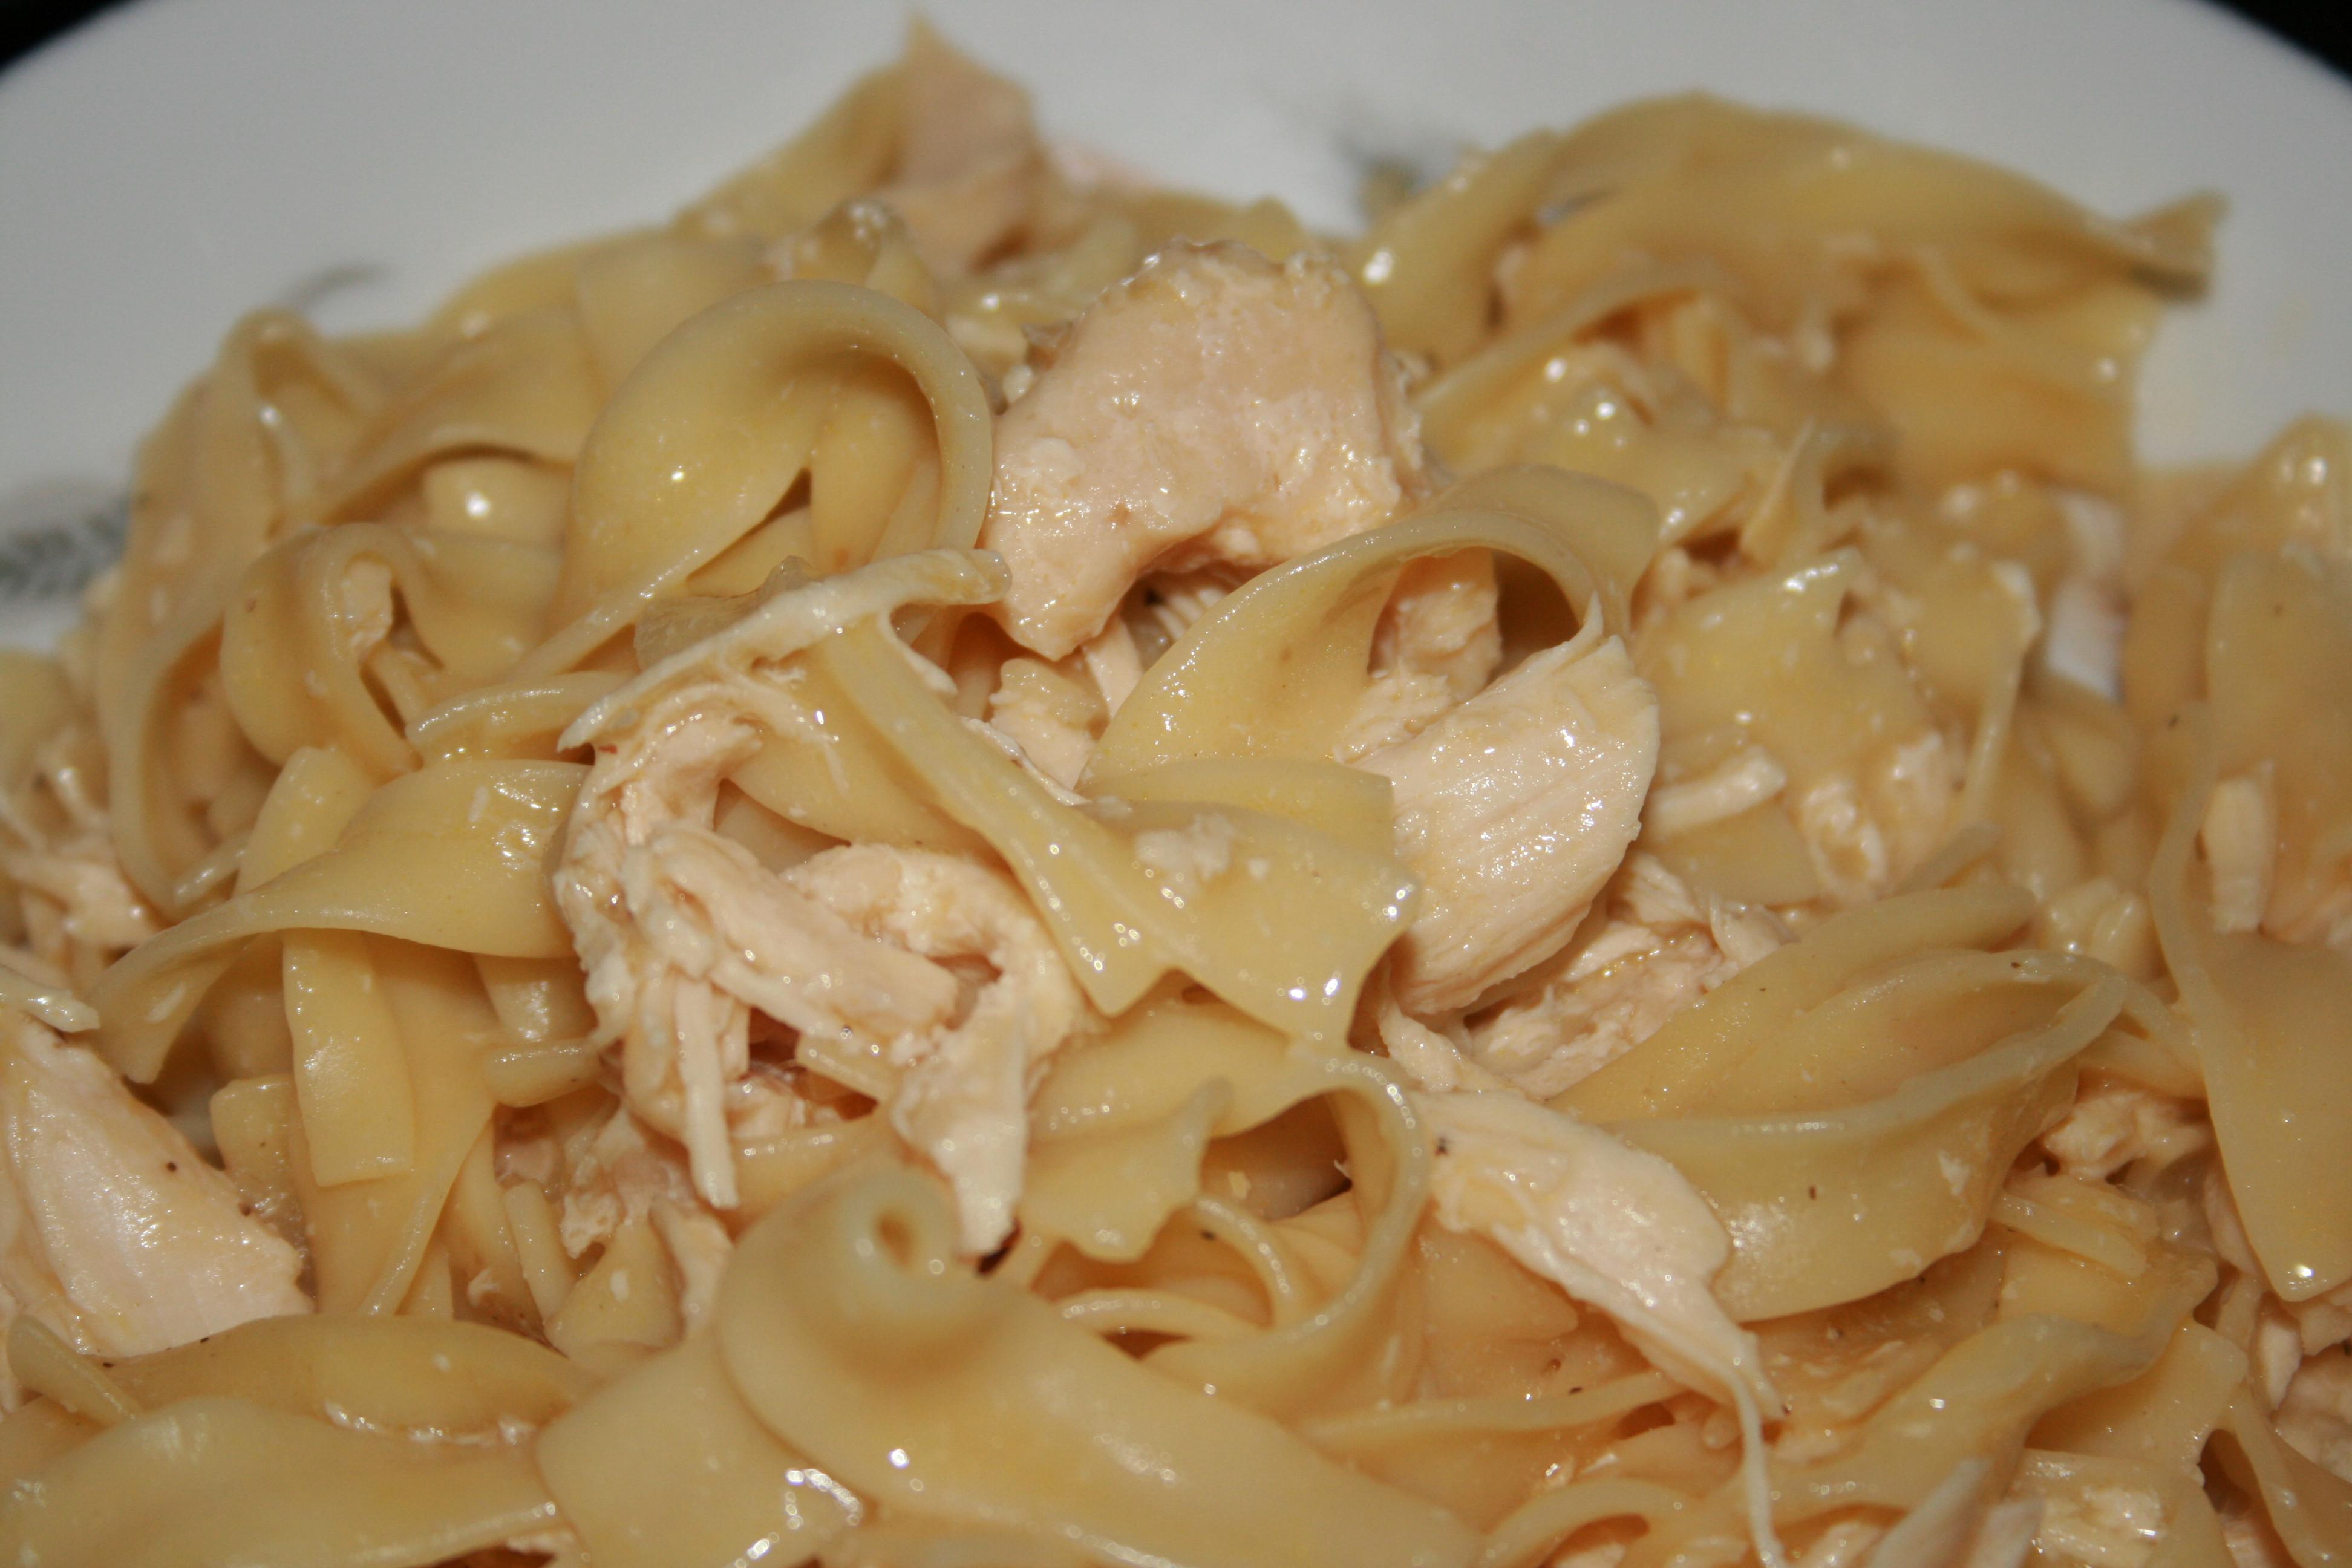 Chicken And Noodles Crock Pot  Crock Pot Chicken and Noodles